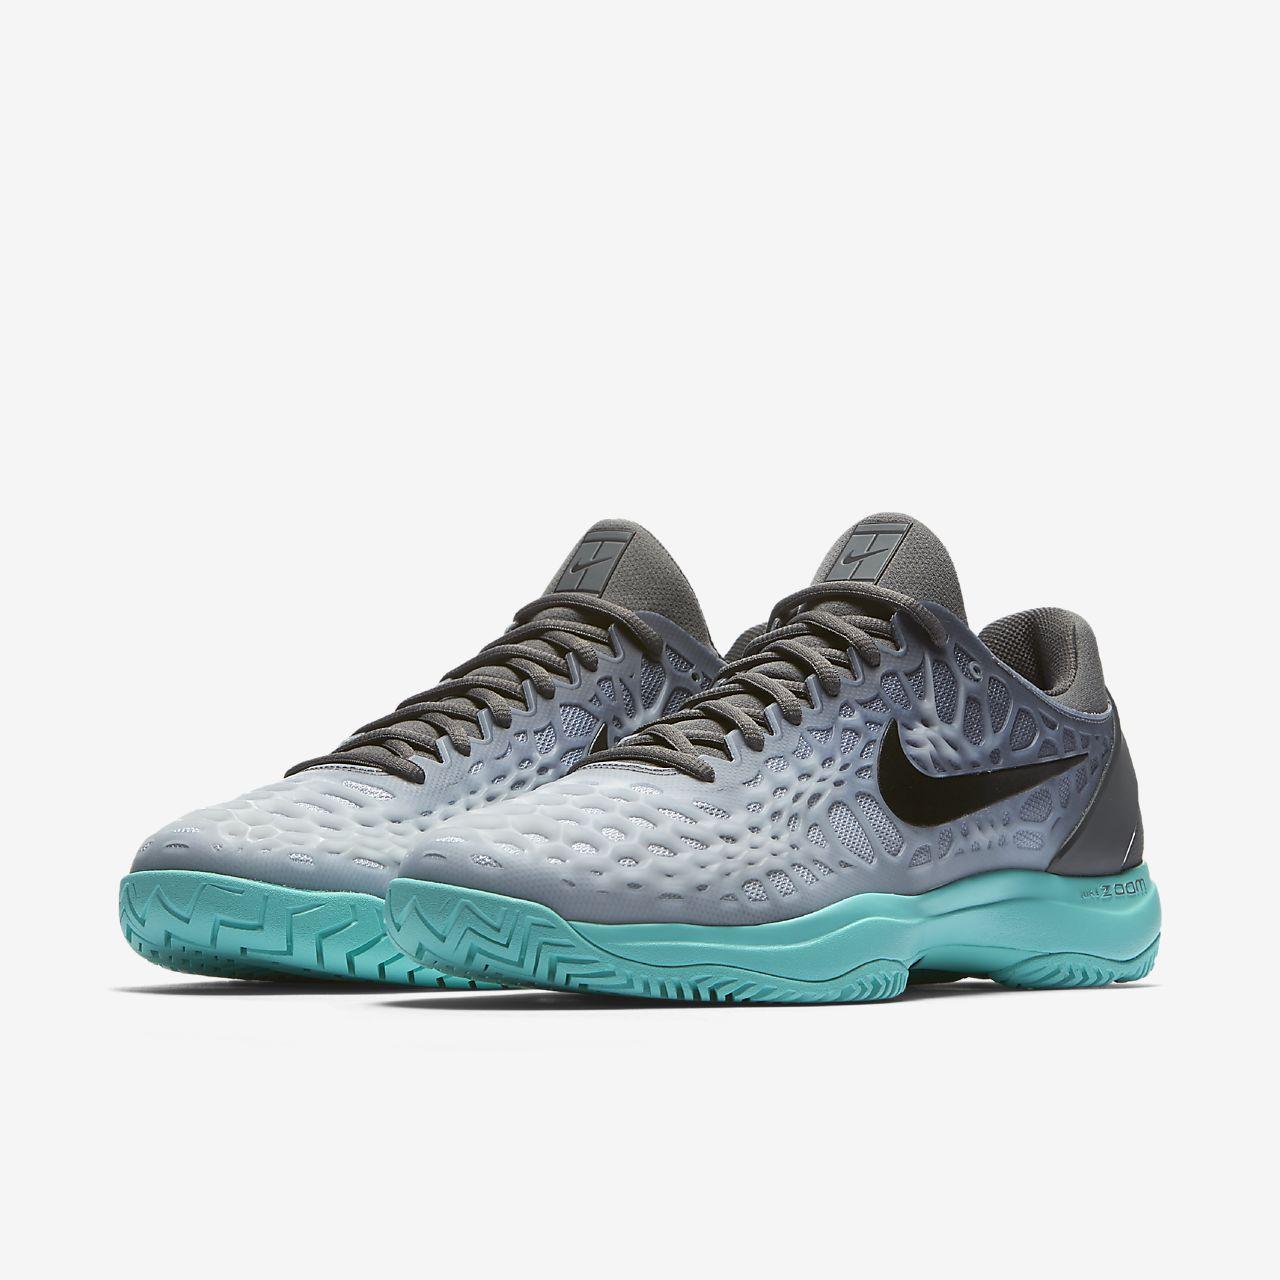 Nike Zoom Cage 3 Mens Tennis Shoe Nikecom Au-8592